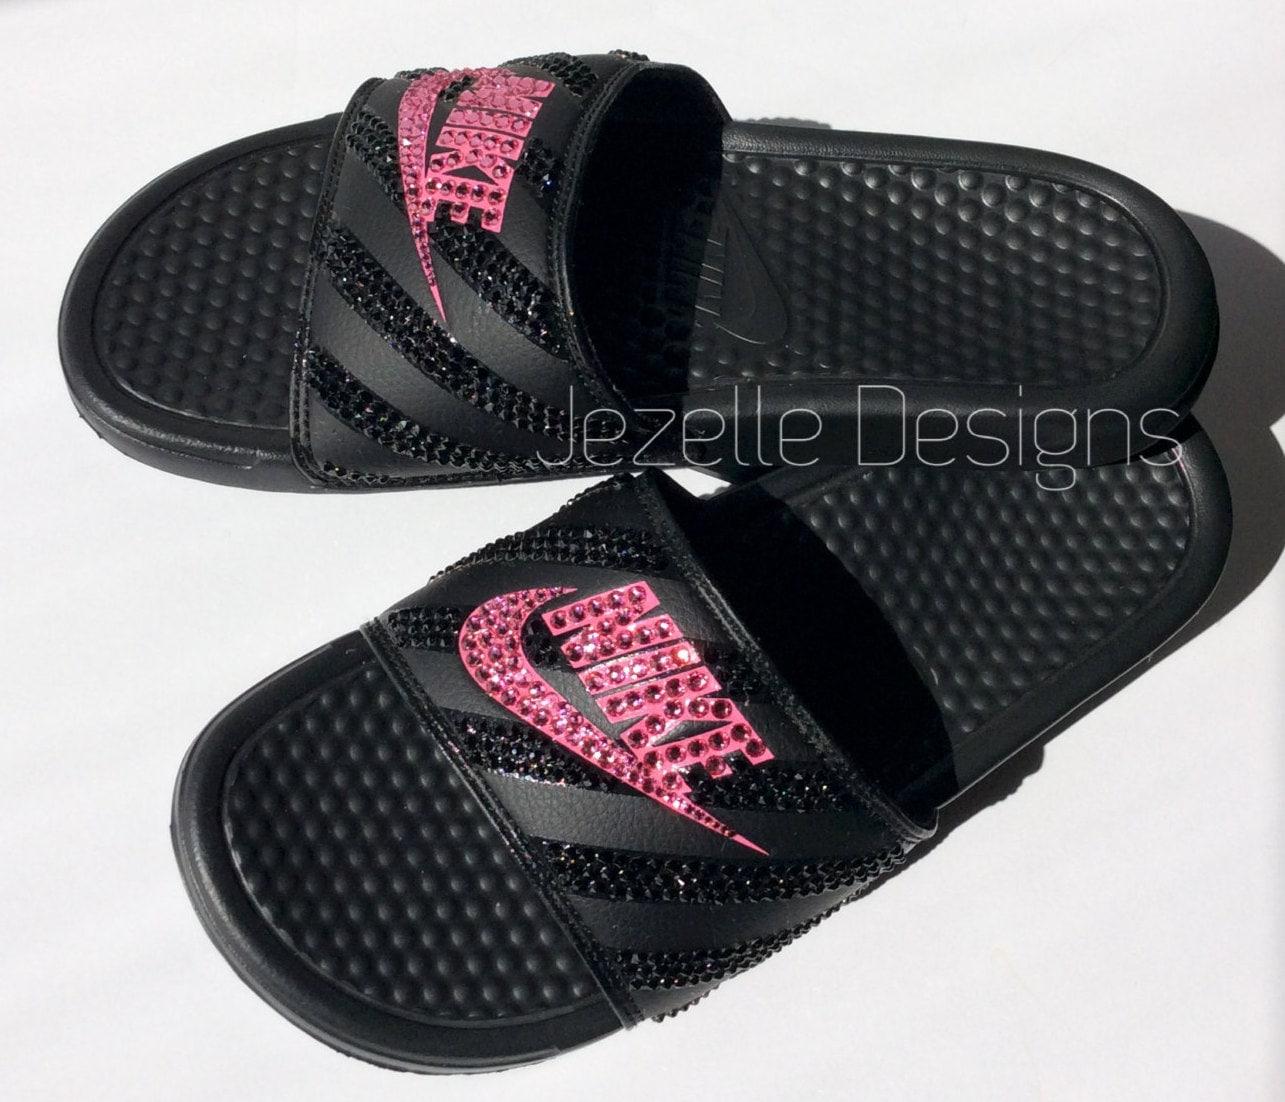 7ff8f96c3b39fc Swarovski Nike Benassi Slide Sandals with Swarovski Crystals